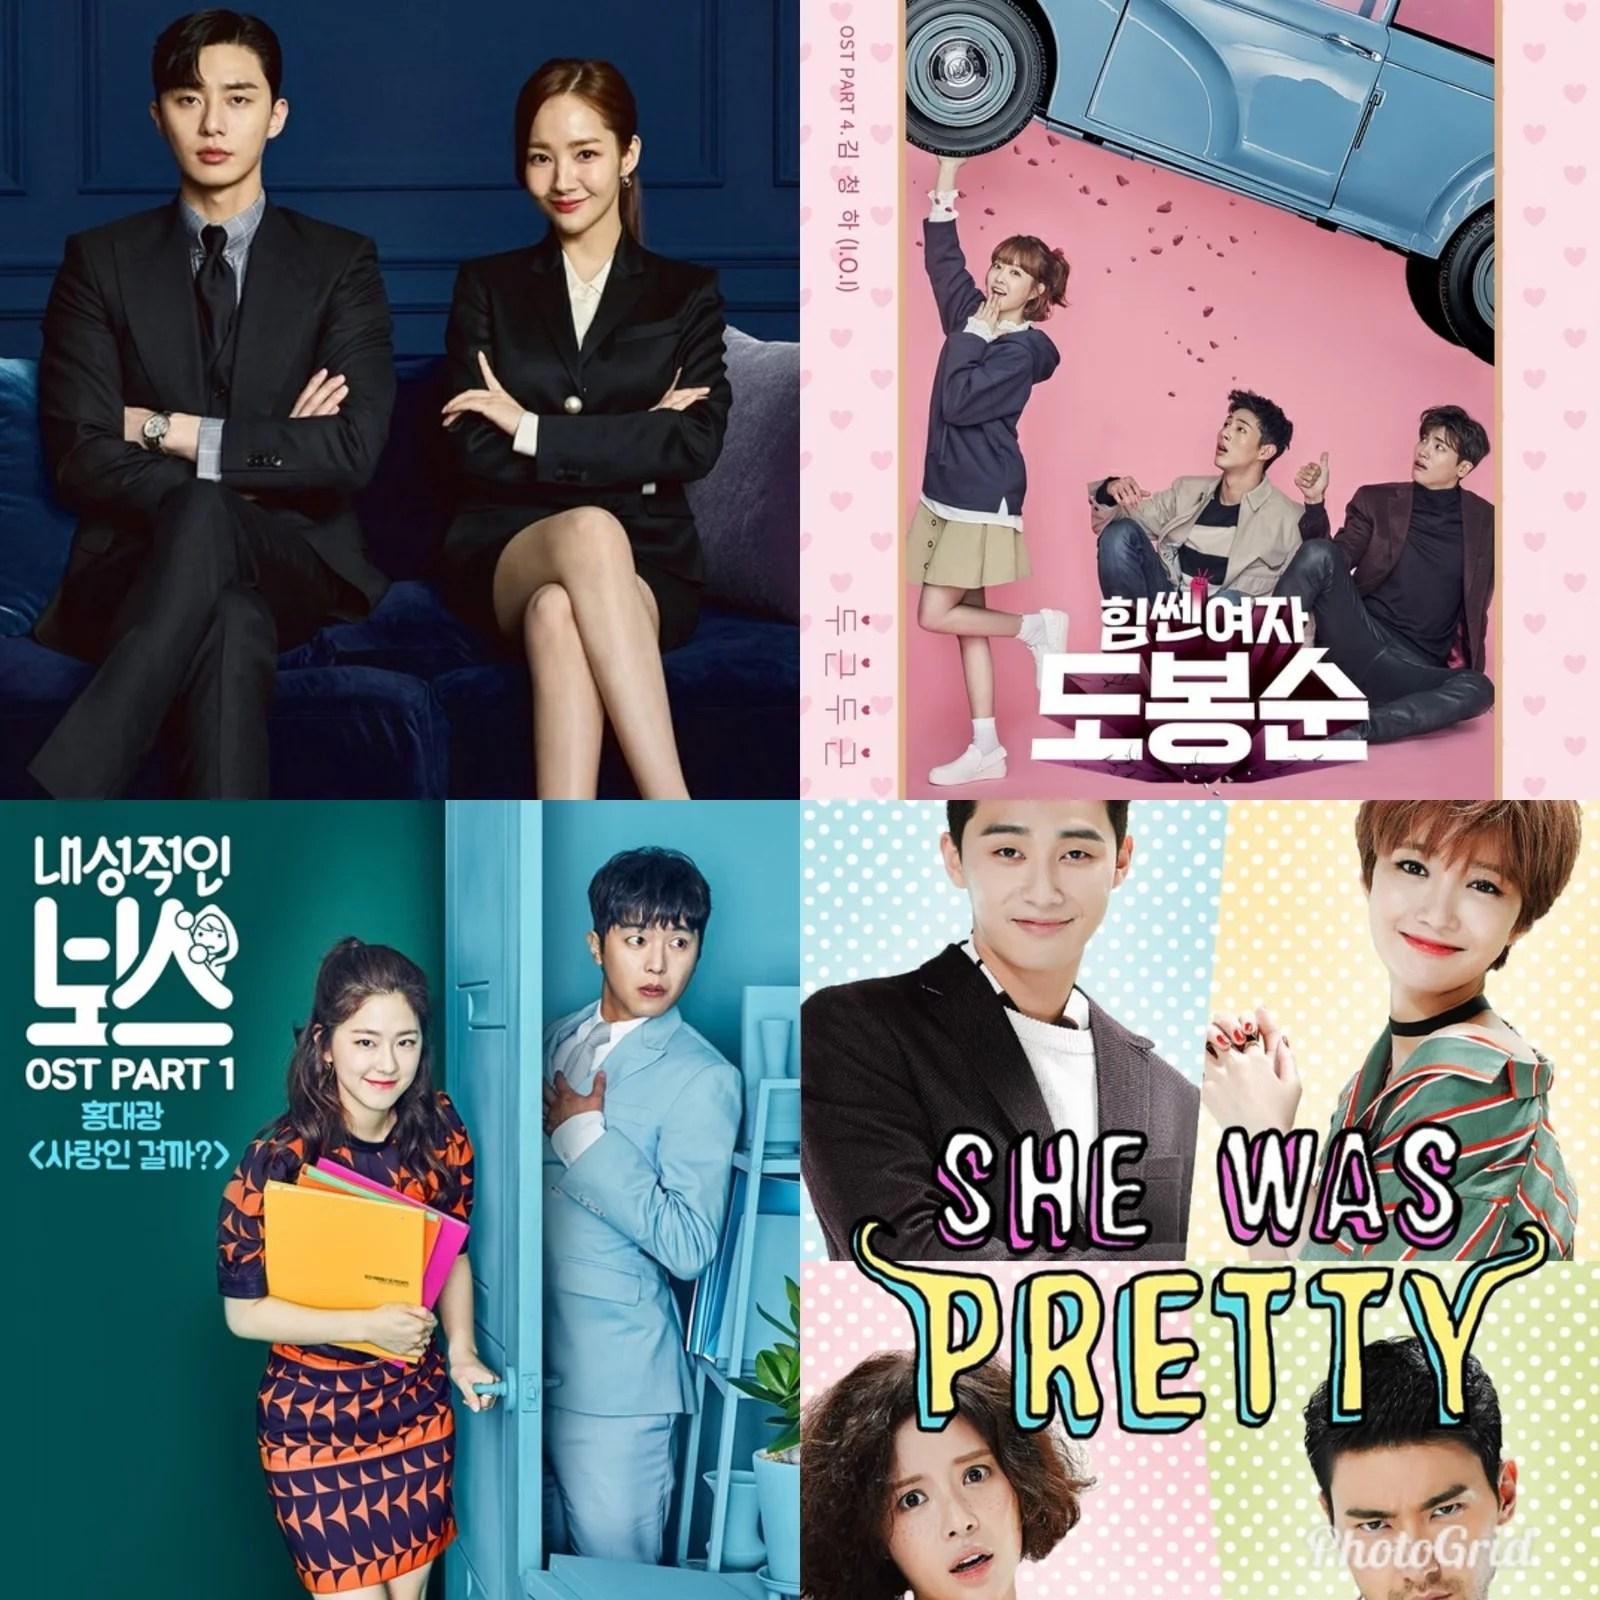 Office Romance Korean Dramas